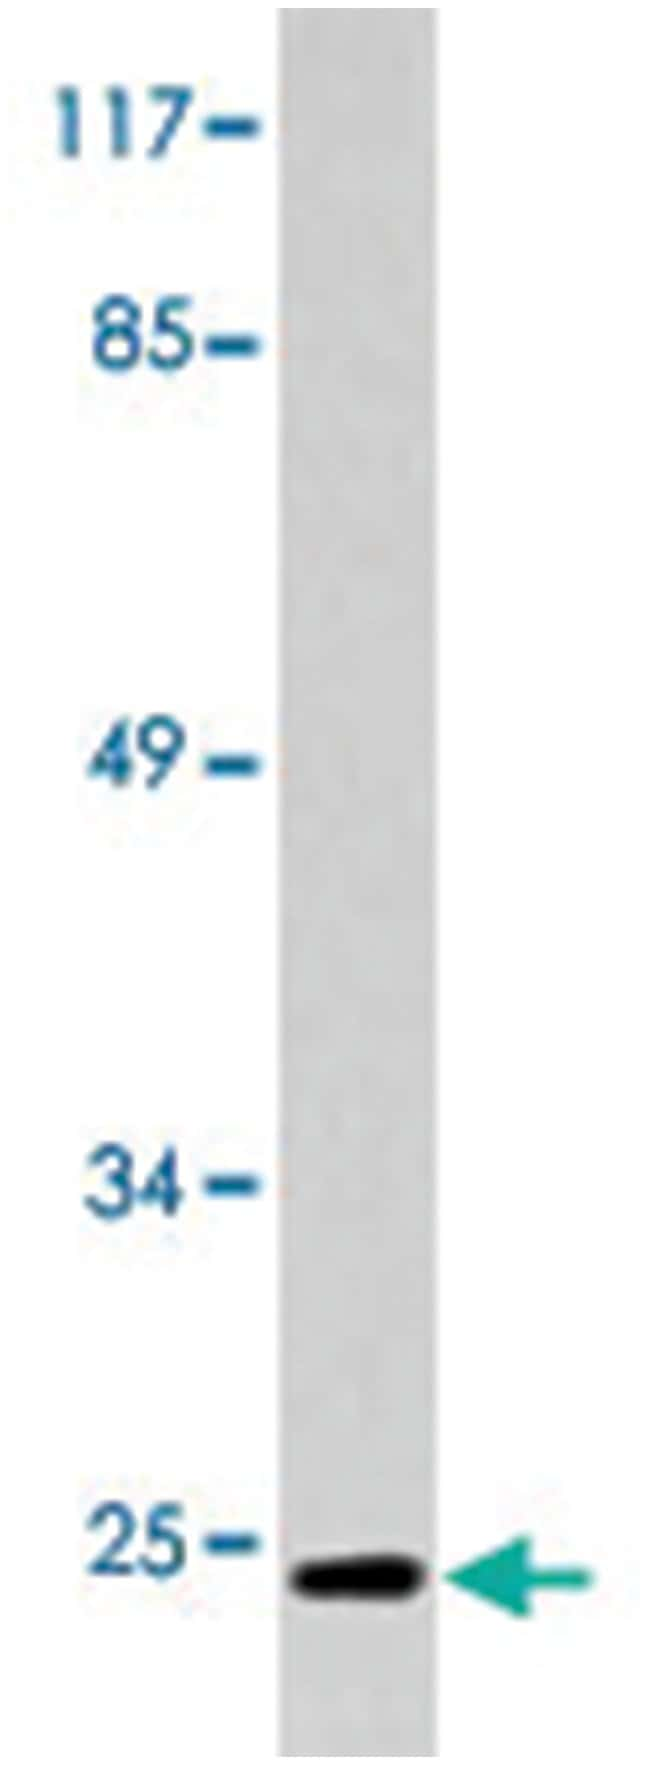 CD247 Rabbit anti-Human, Polyclonal Antibody, Abnova 100µL; Unlabeled:Life